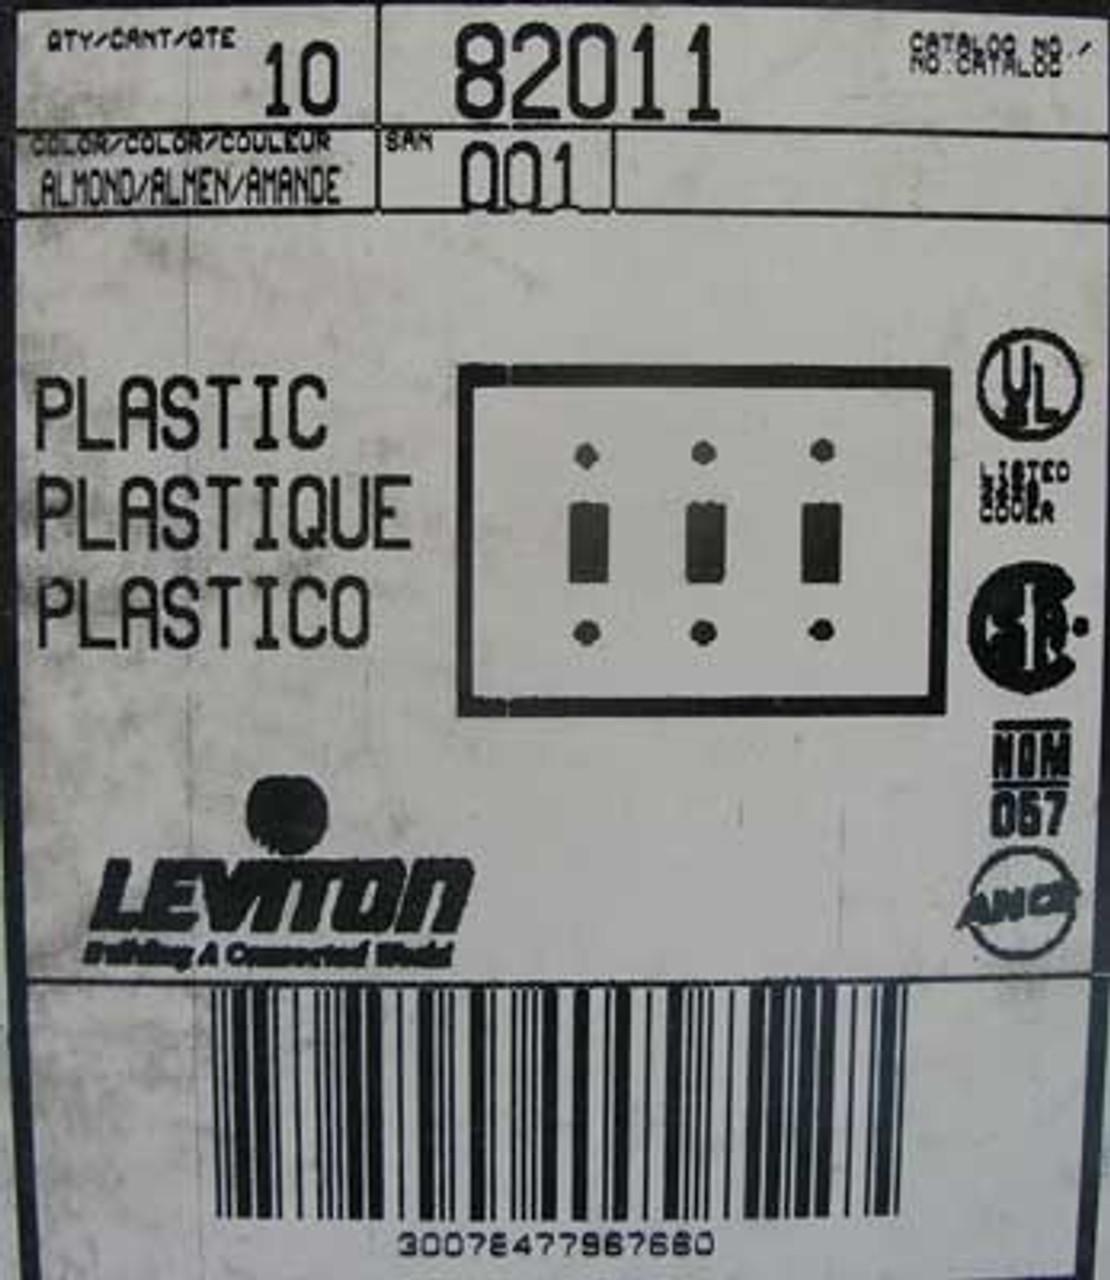 Leviton 82011 3 Gang 3 Toggle Wall Plate Almond (Lot of 10)